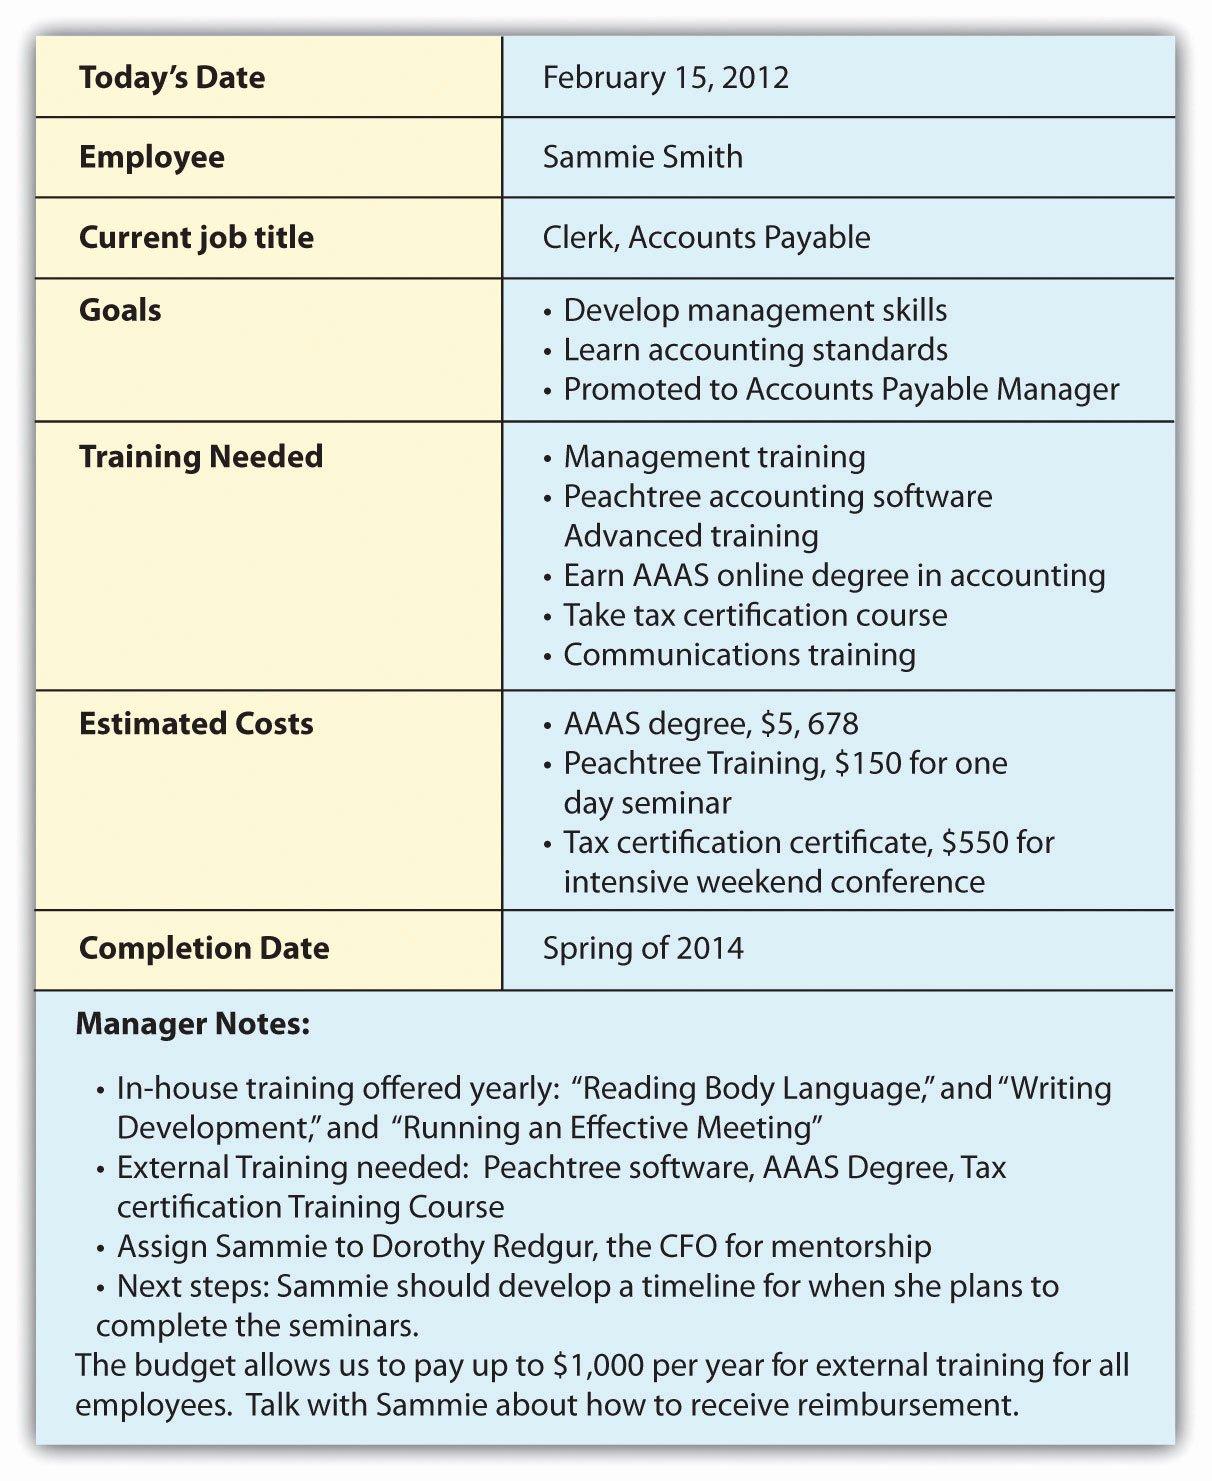 Professional Development Certificate Template Best Of Human Resource Management V1 0